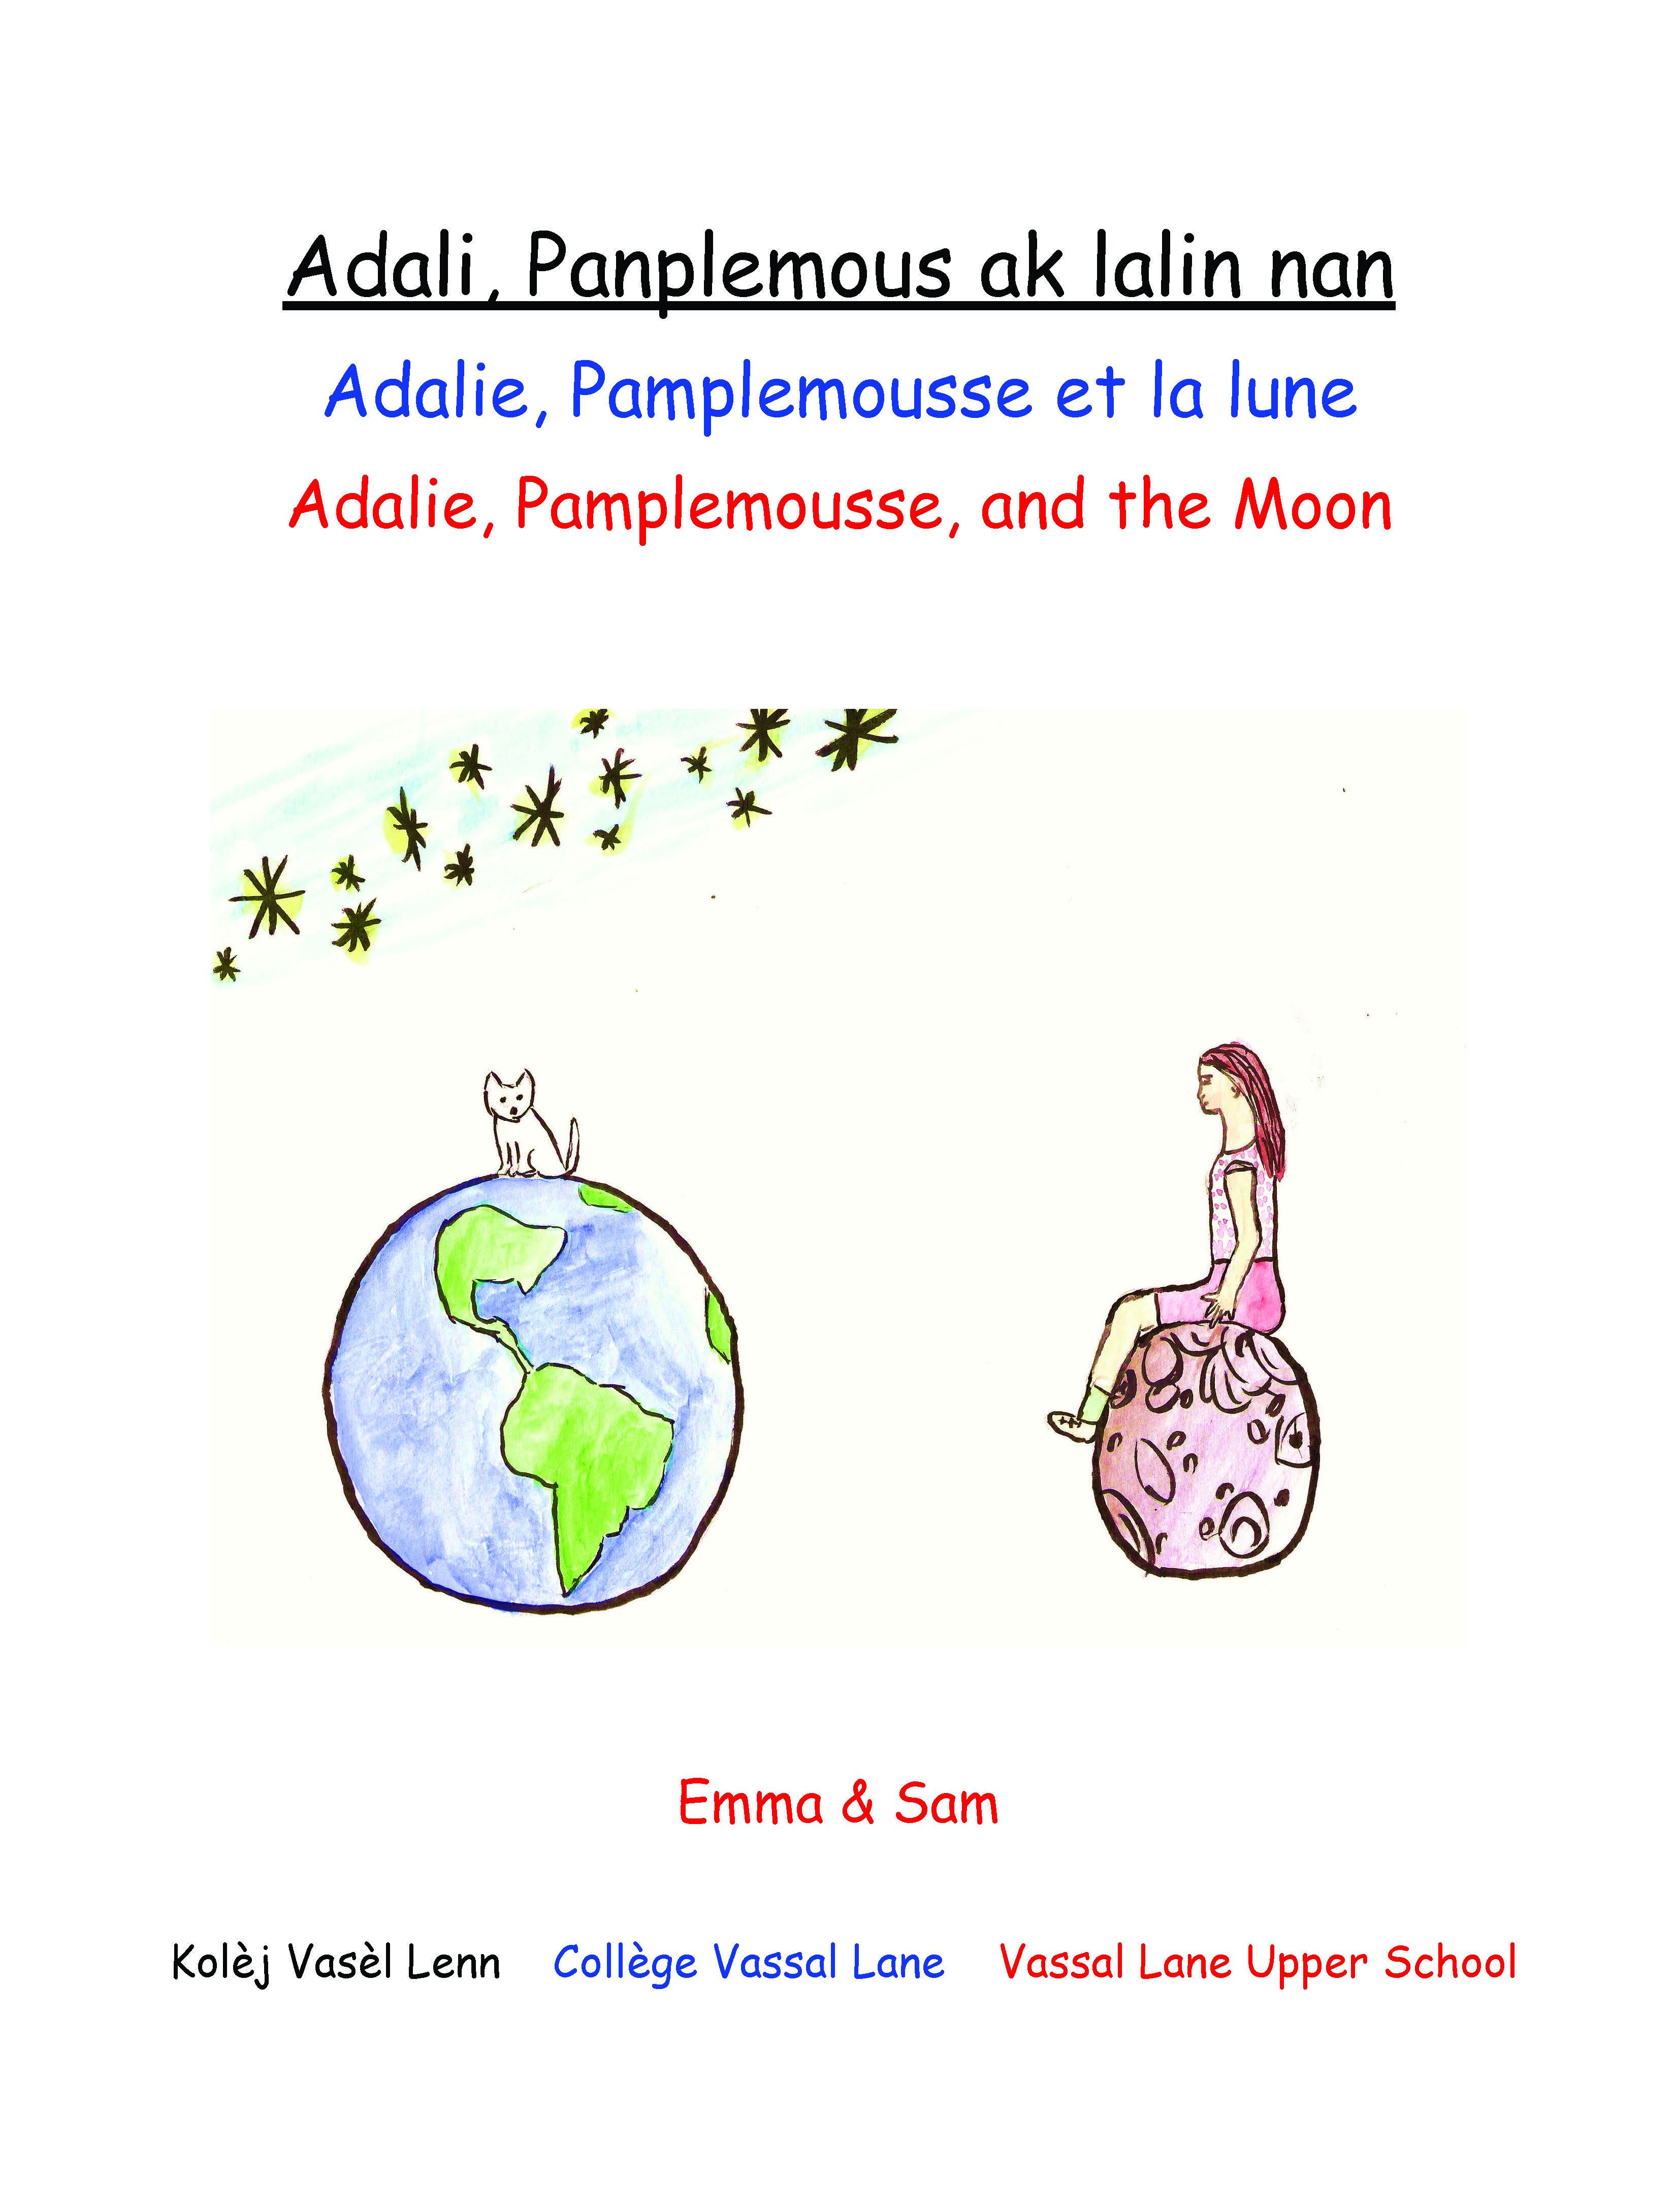 Adali, Panplemous ak lalin nan / Adalie, Pamplemousse, and the Moon